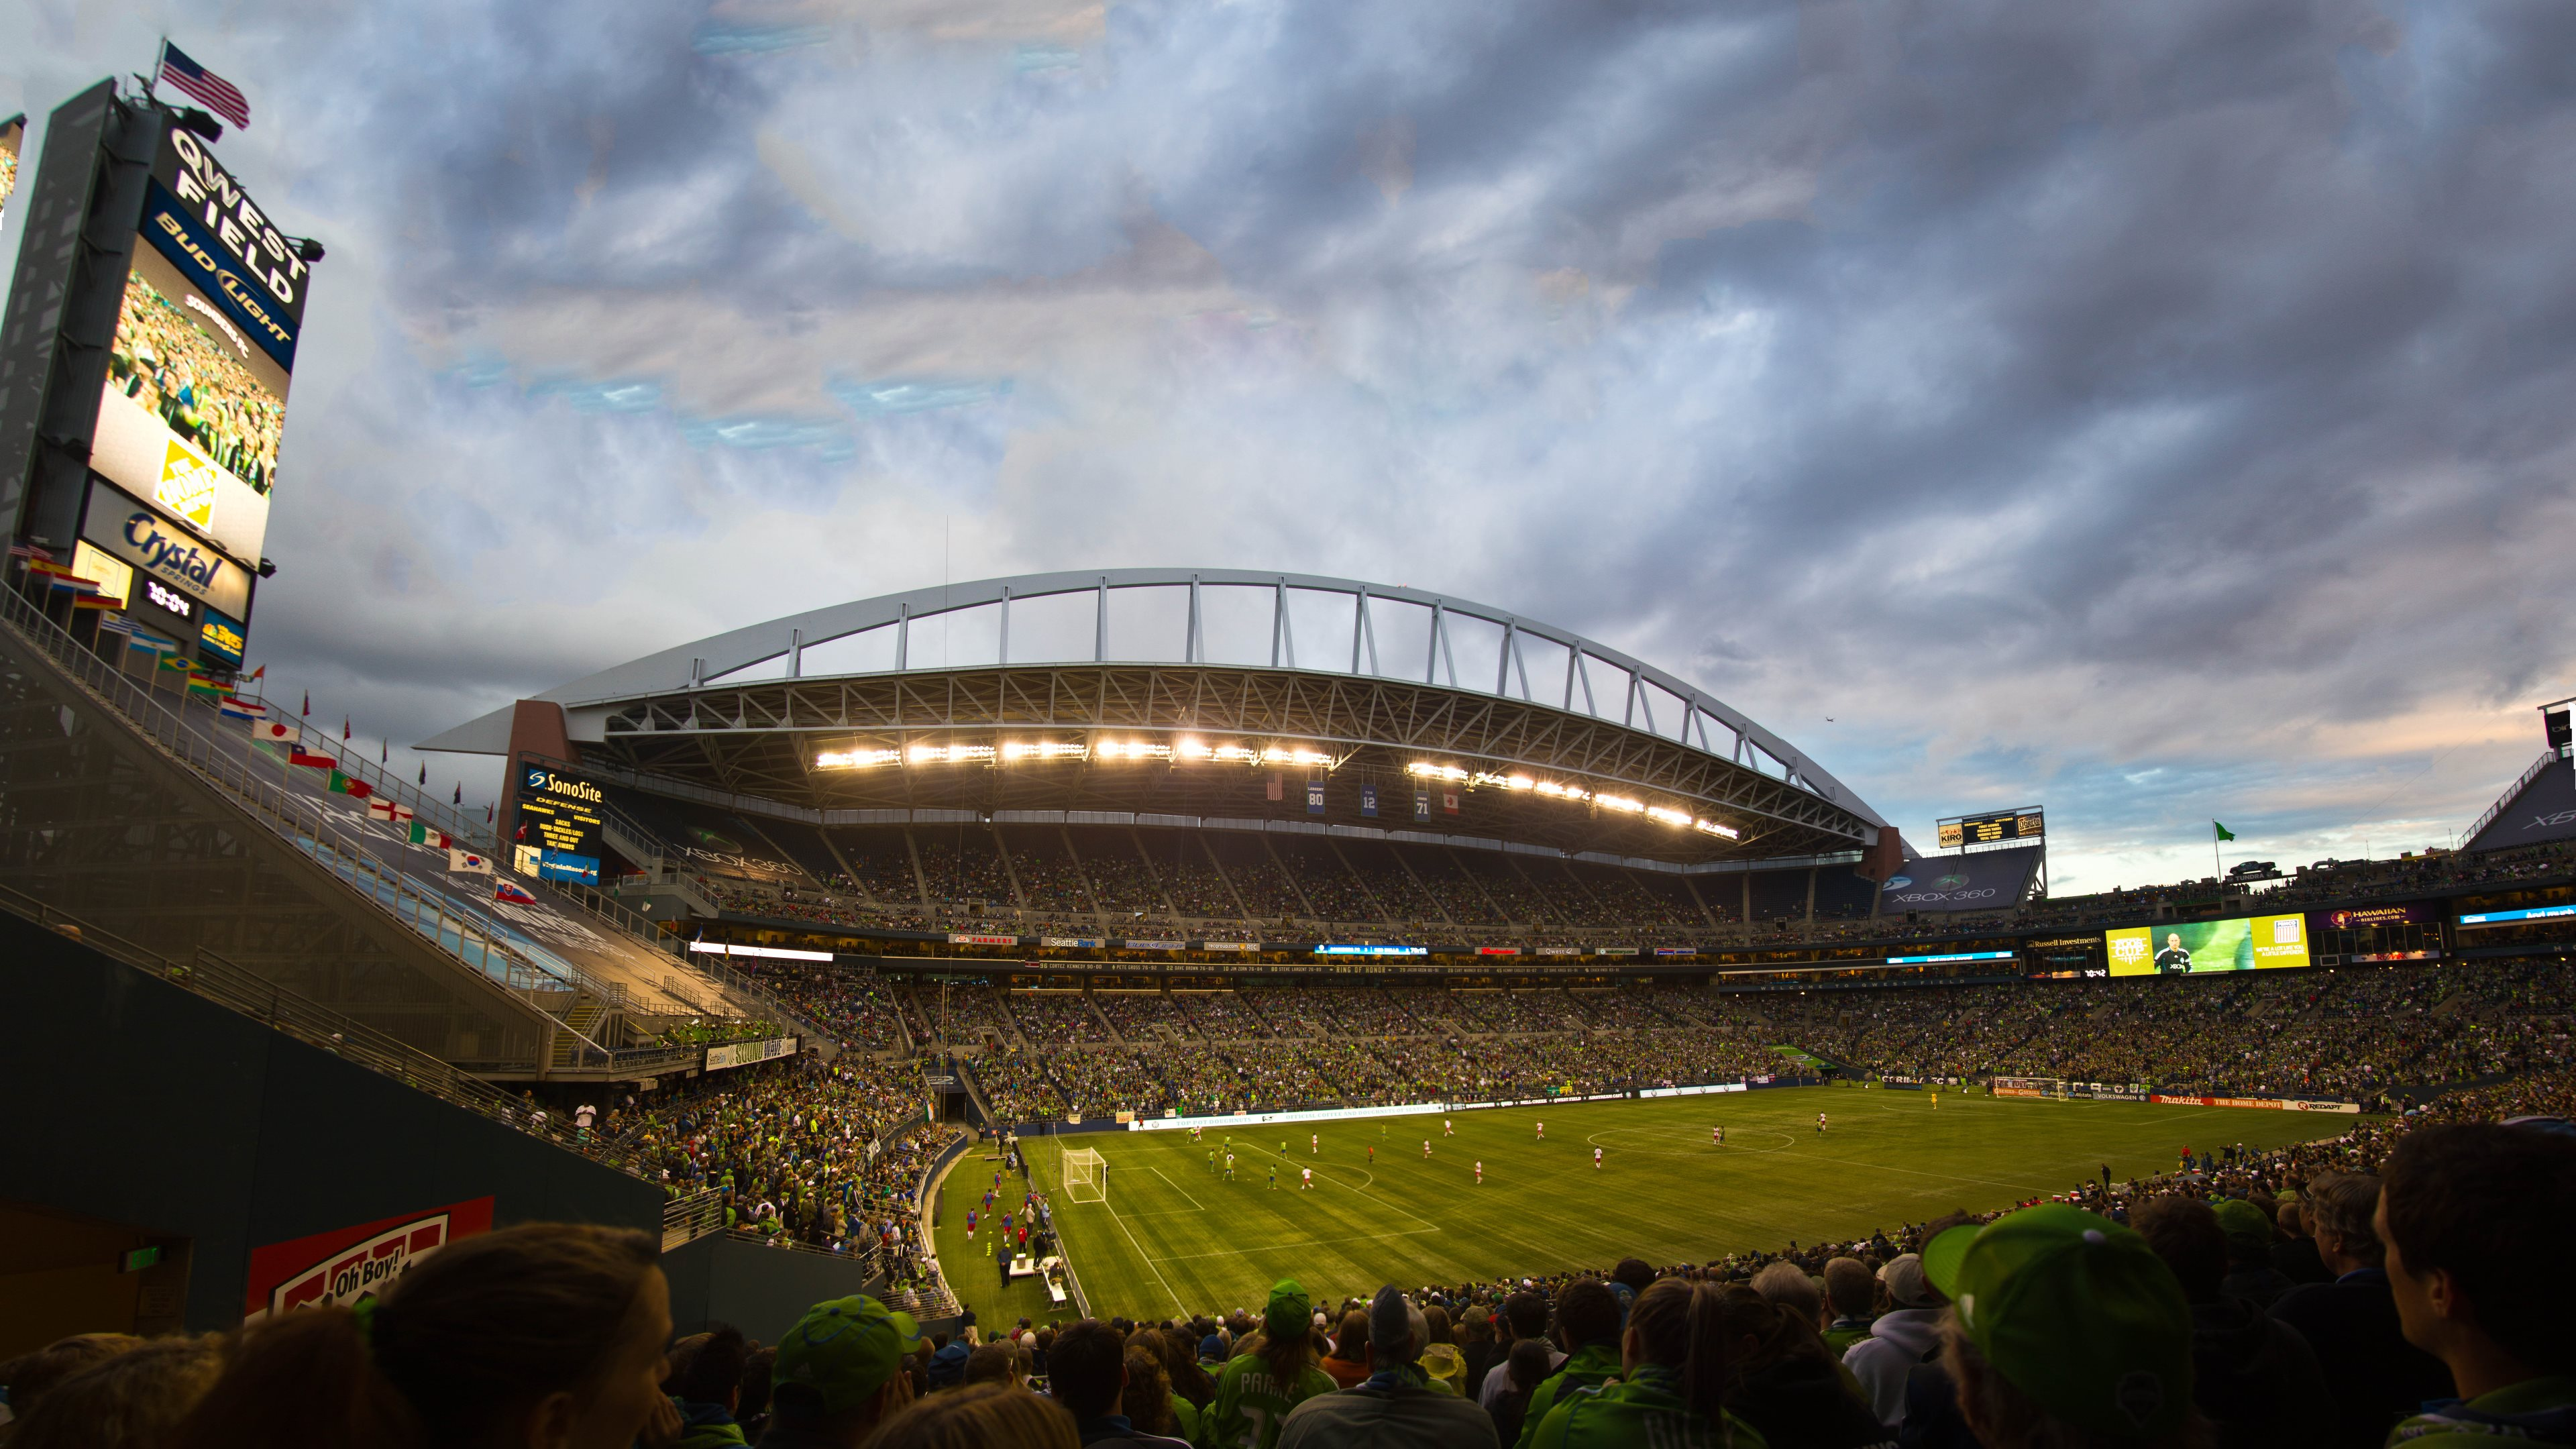 4k Ultra Hd Wallpaper Football: Football Wallpapers 4K